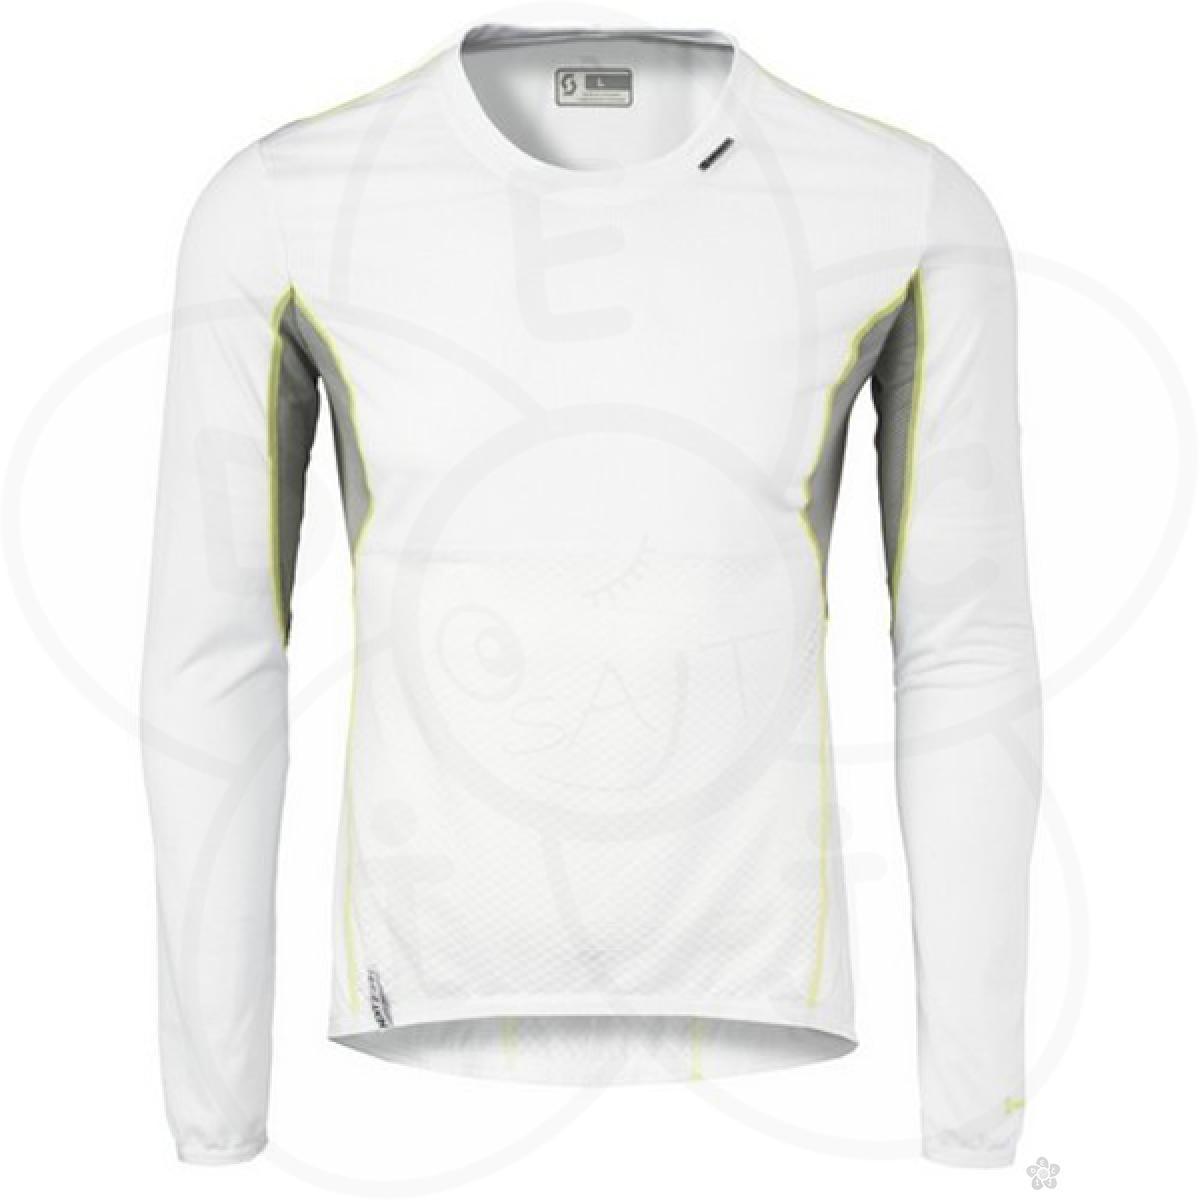 Donji veš majica SCOTT NEXT2SKIN DUGI RUKAVI light grey 2015, SC2215960177